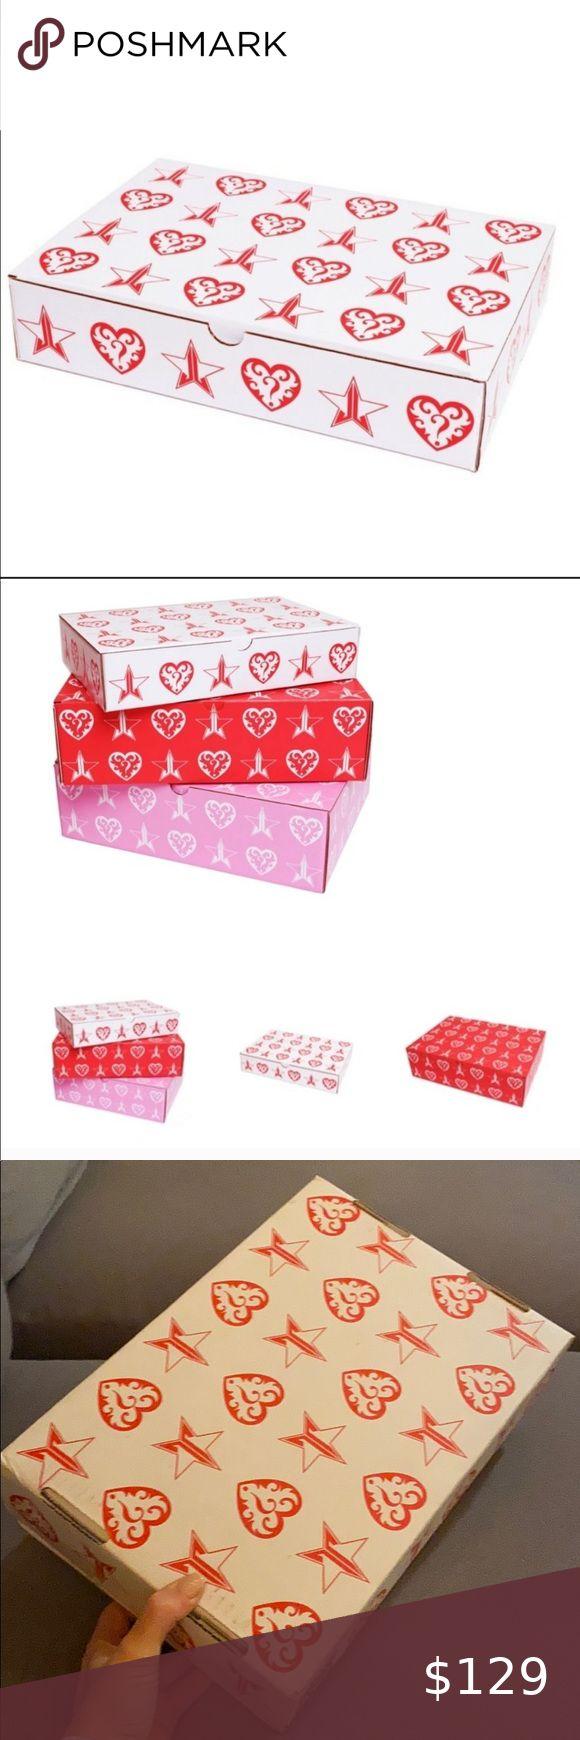 Jeffree Star Cosmetics Premium Vday Mystery Box in 2020